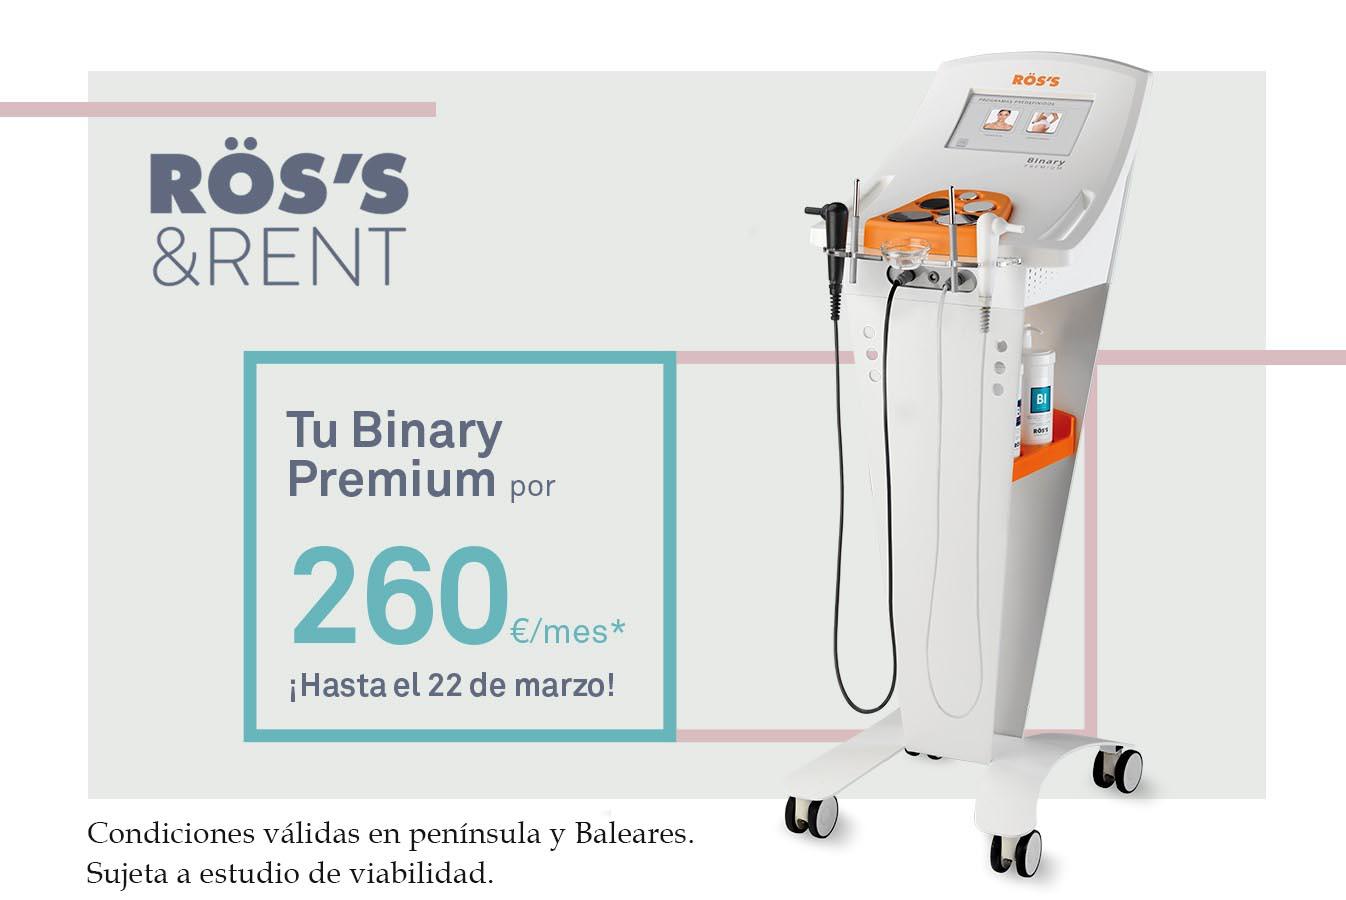 ROSS Baner promo aniversario Binary Premium